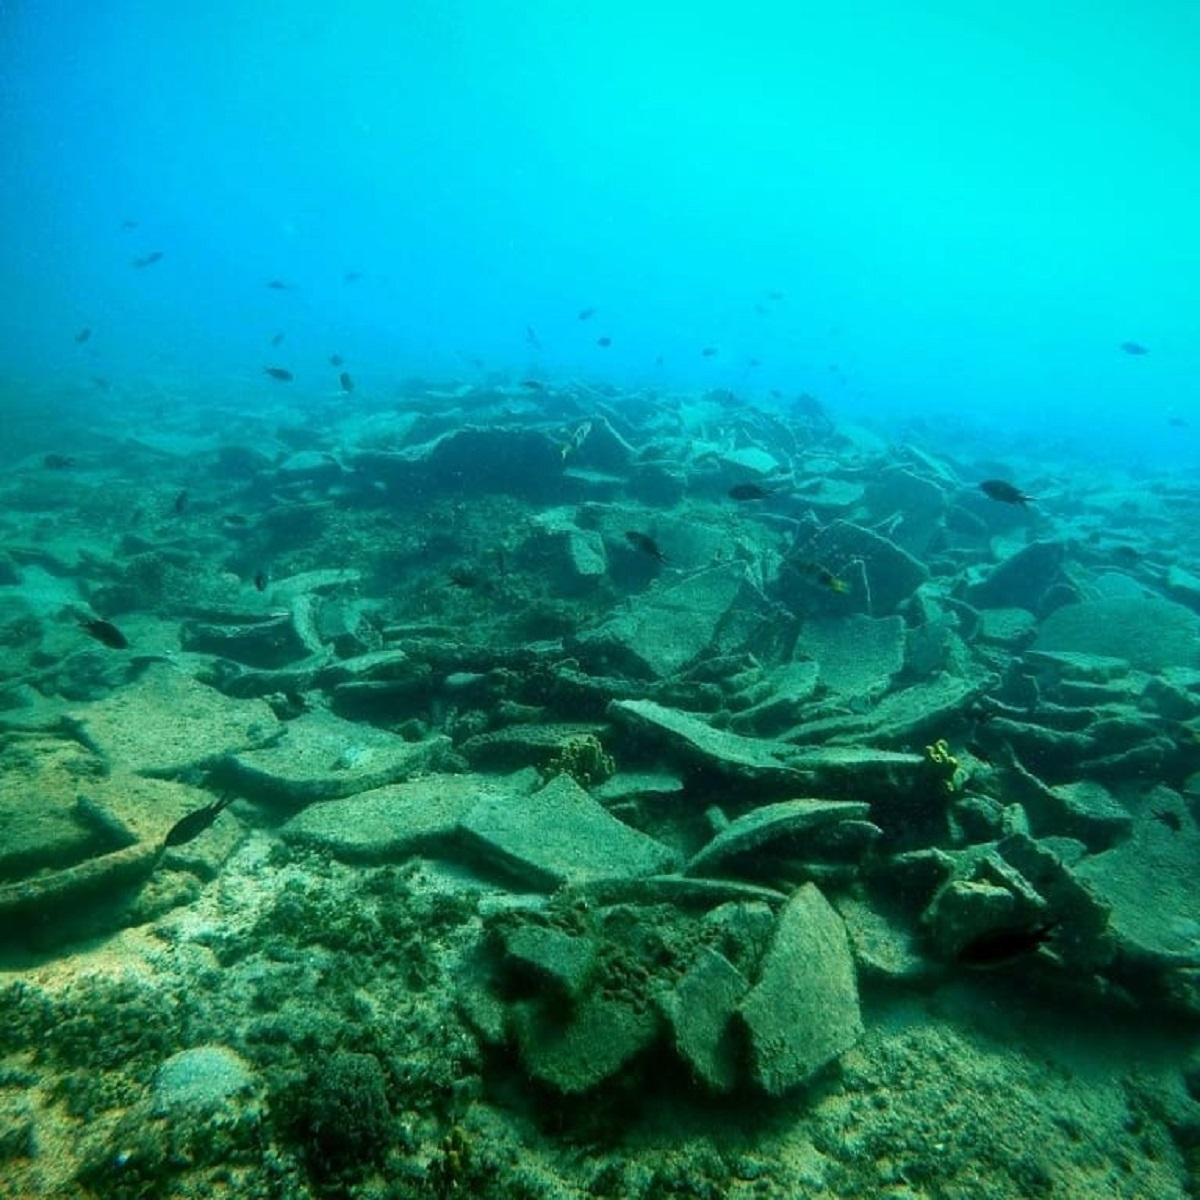 Grecia museo submarino